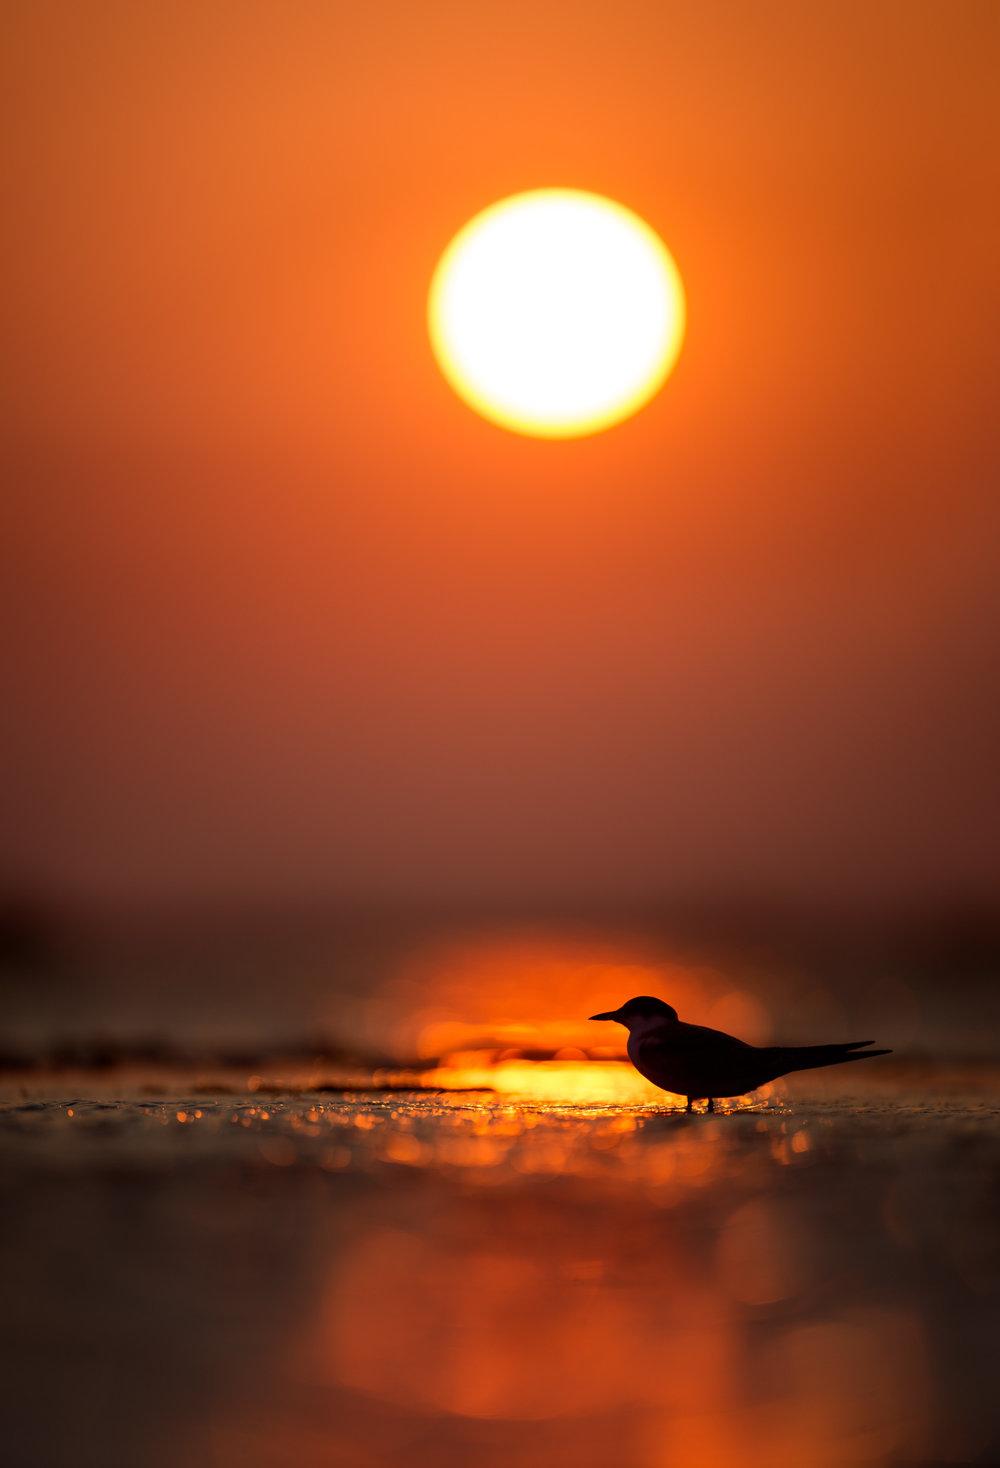 029_jersey_shorebirds.jpg